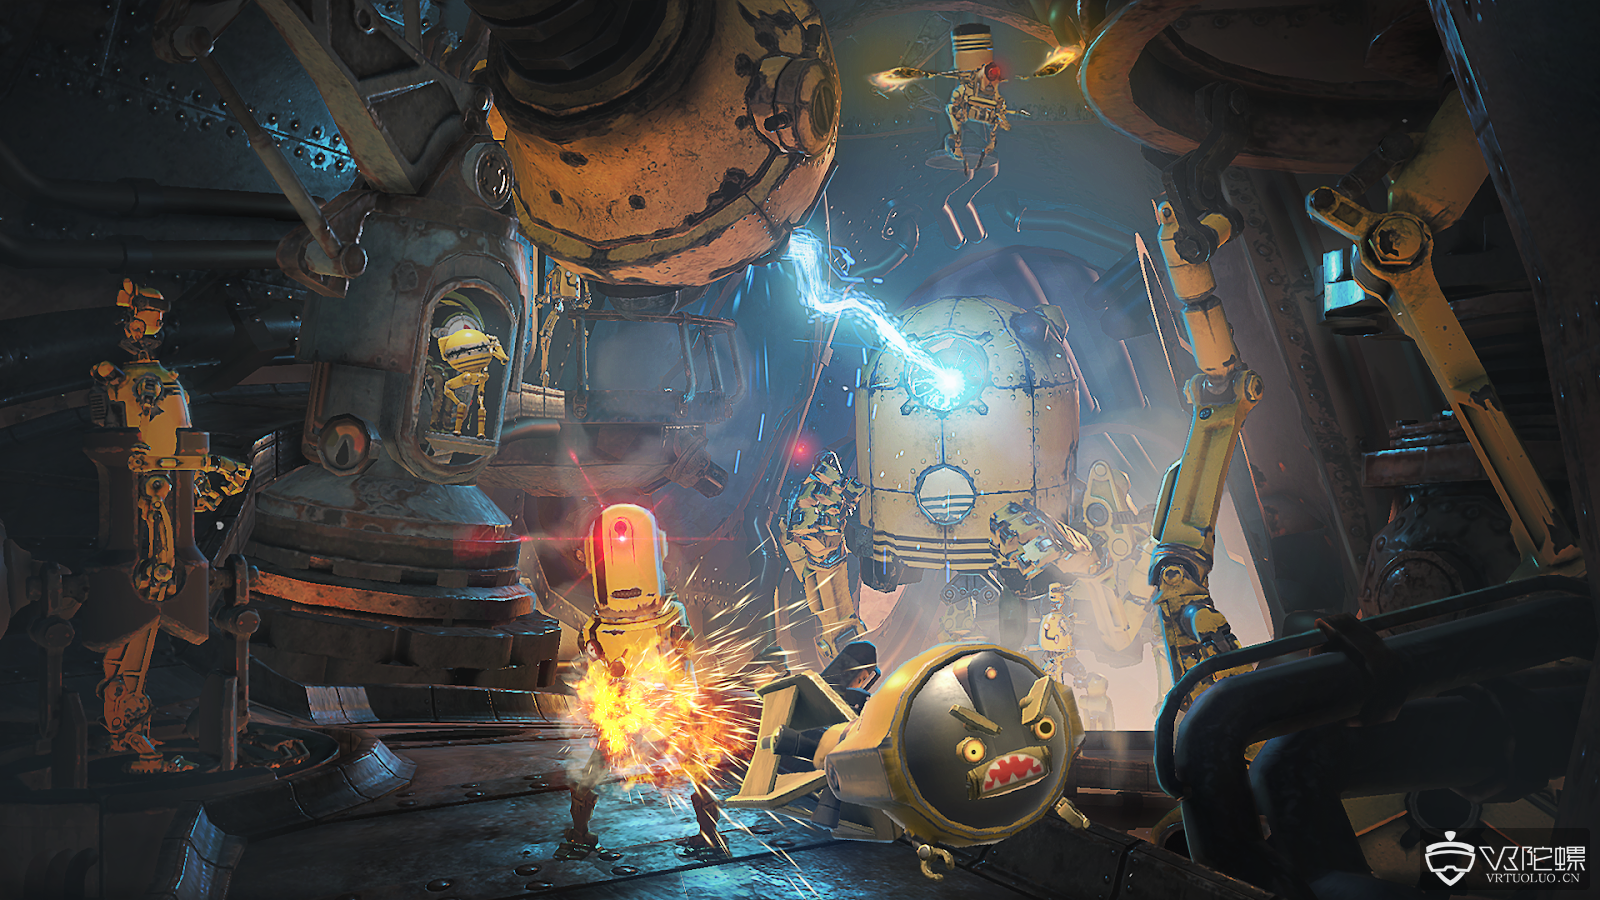 维塔工作室宣布AR游戏《Dr.Grordbort's Invaders》登陆Magic Leap One